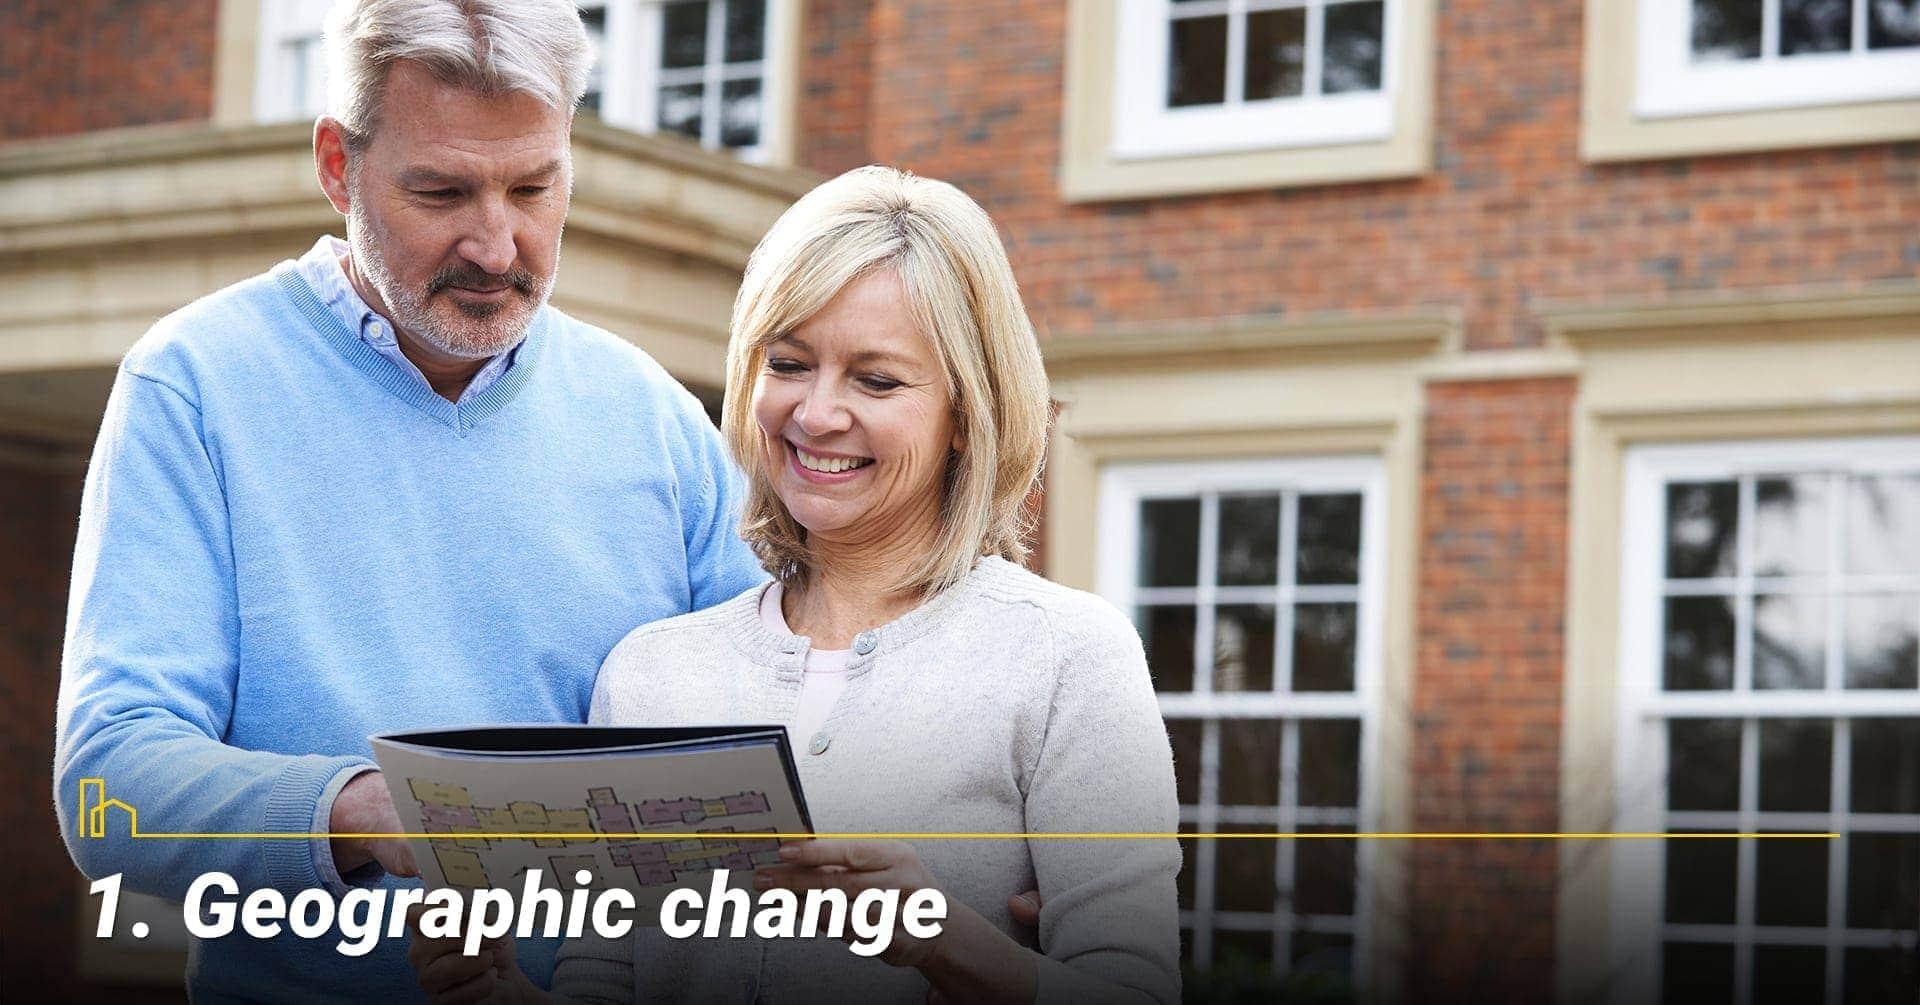 Geographic change